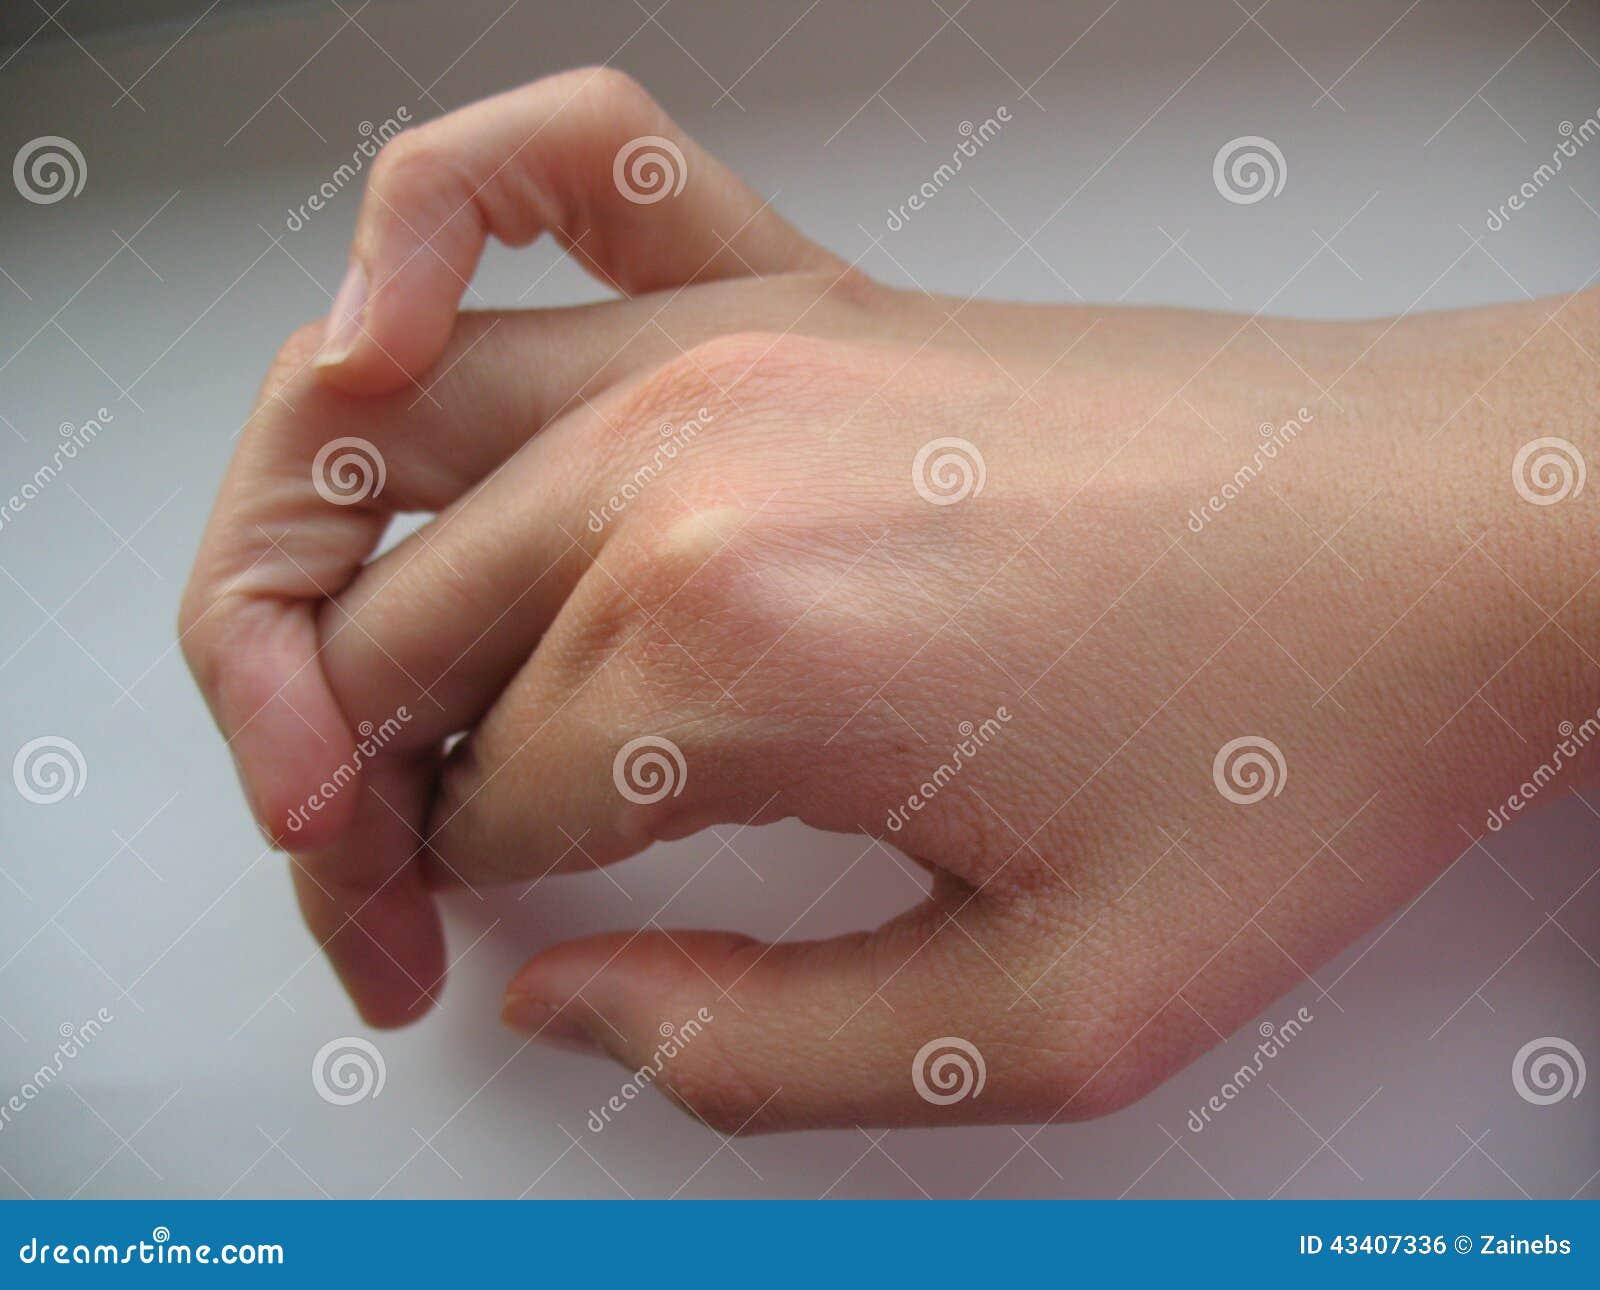 Thumb basal joint rereditary misalignment